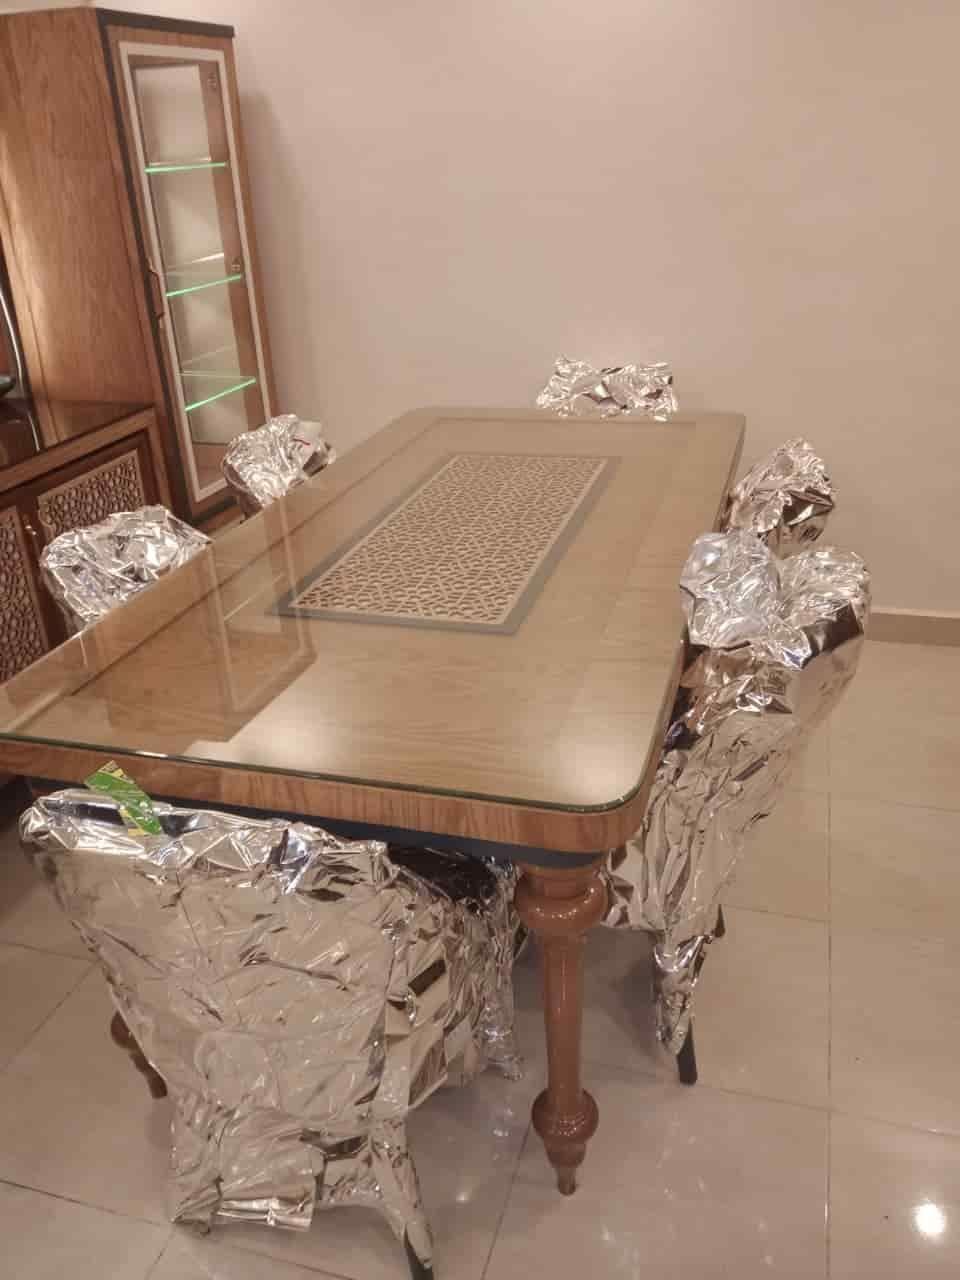 بوفيه سفرة طقم غرف سفره جديده شوفنيرة مودرن كلاسيك Dining Buffet Rustic Dining Table Dining Table